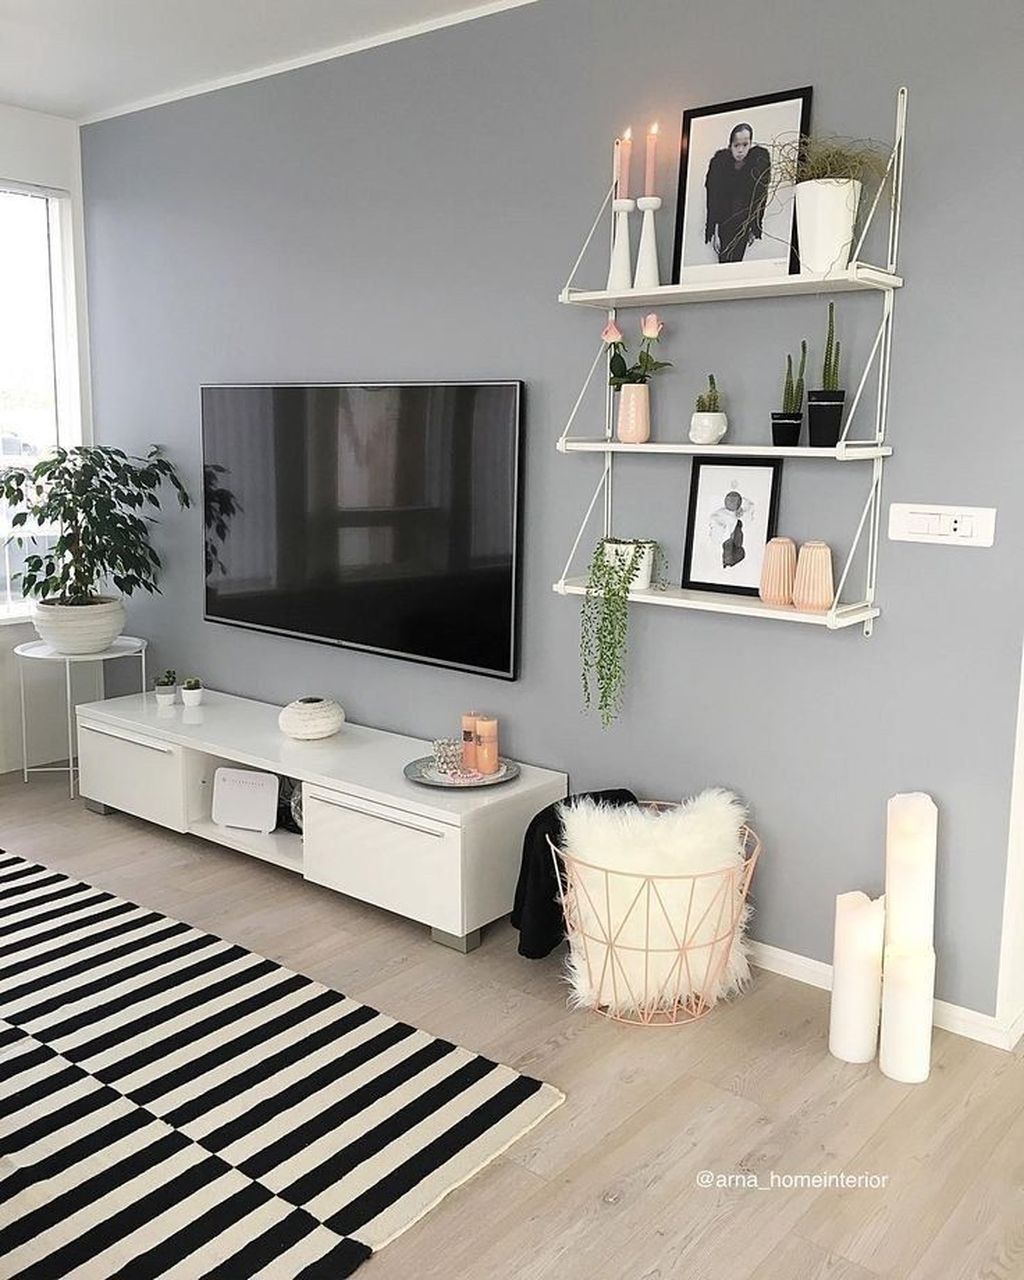 30 Beautiful Living Room Wall Decoration Ideas You Can Try Living Room Decor Tips Living Room Decor Apartment Apartment Living Room Design